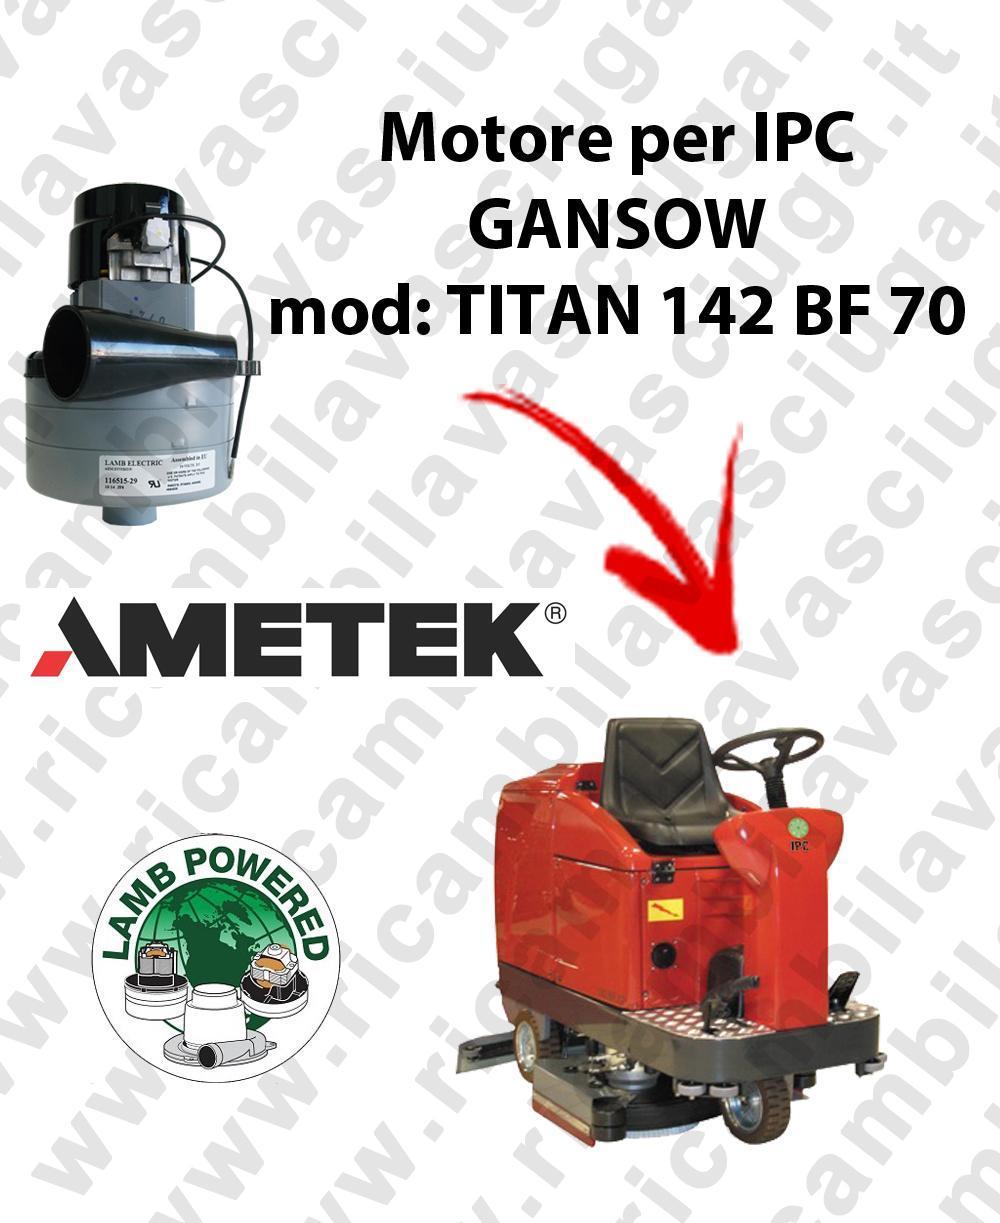 TITAN 142 BF 70 Motore de aspiración LAMB AMETEK para fregadora IPC GANSOW